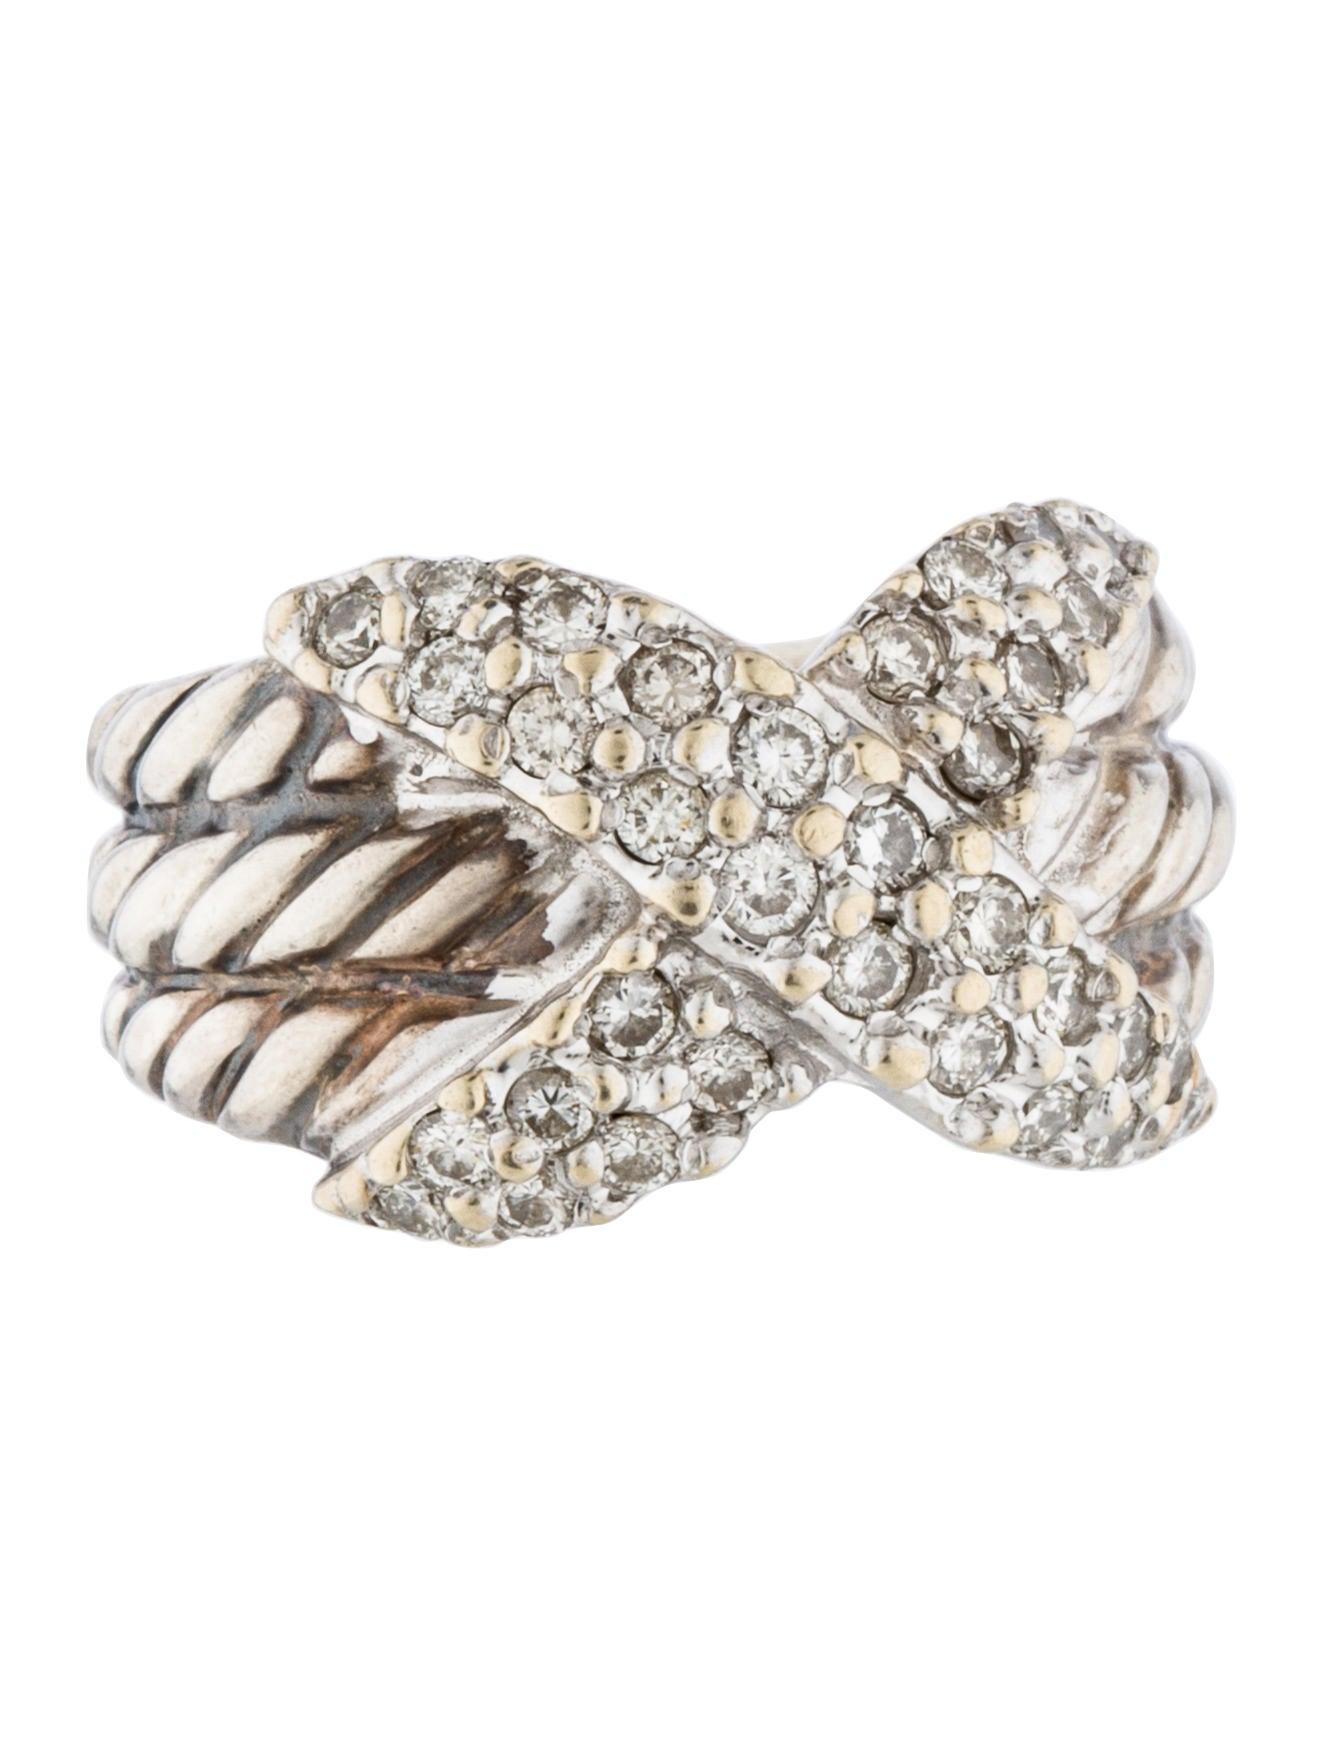 David yurman diamond x cable ring rings dvy37722 the for David yurman inspired jewelry rings